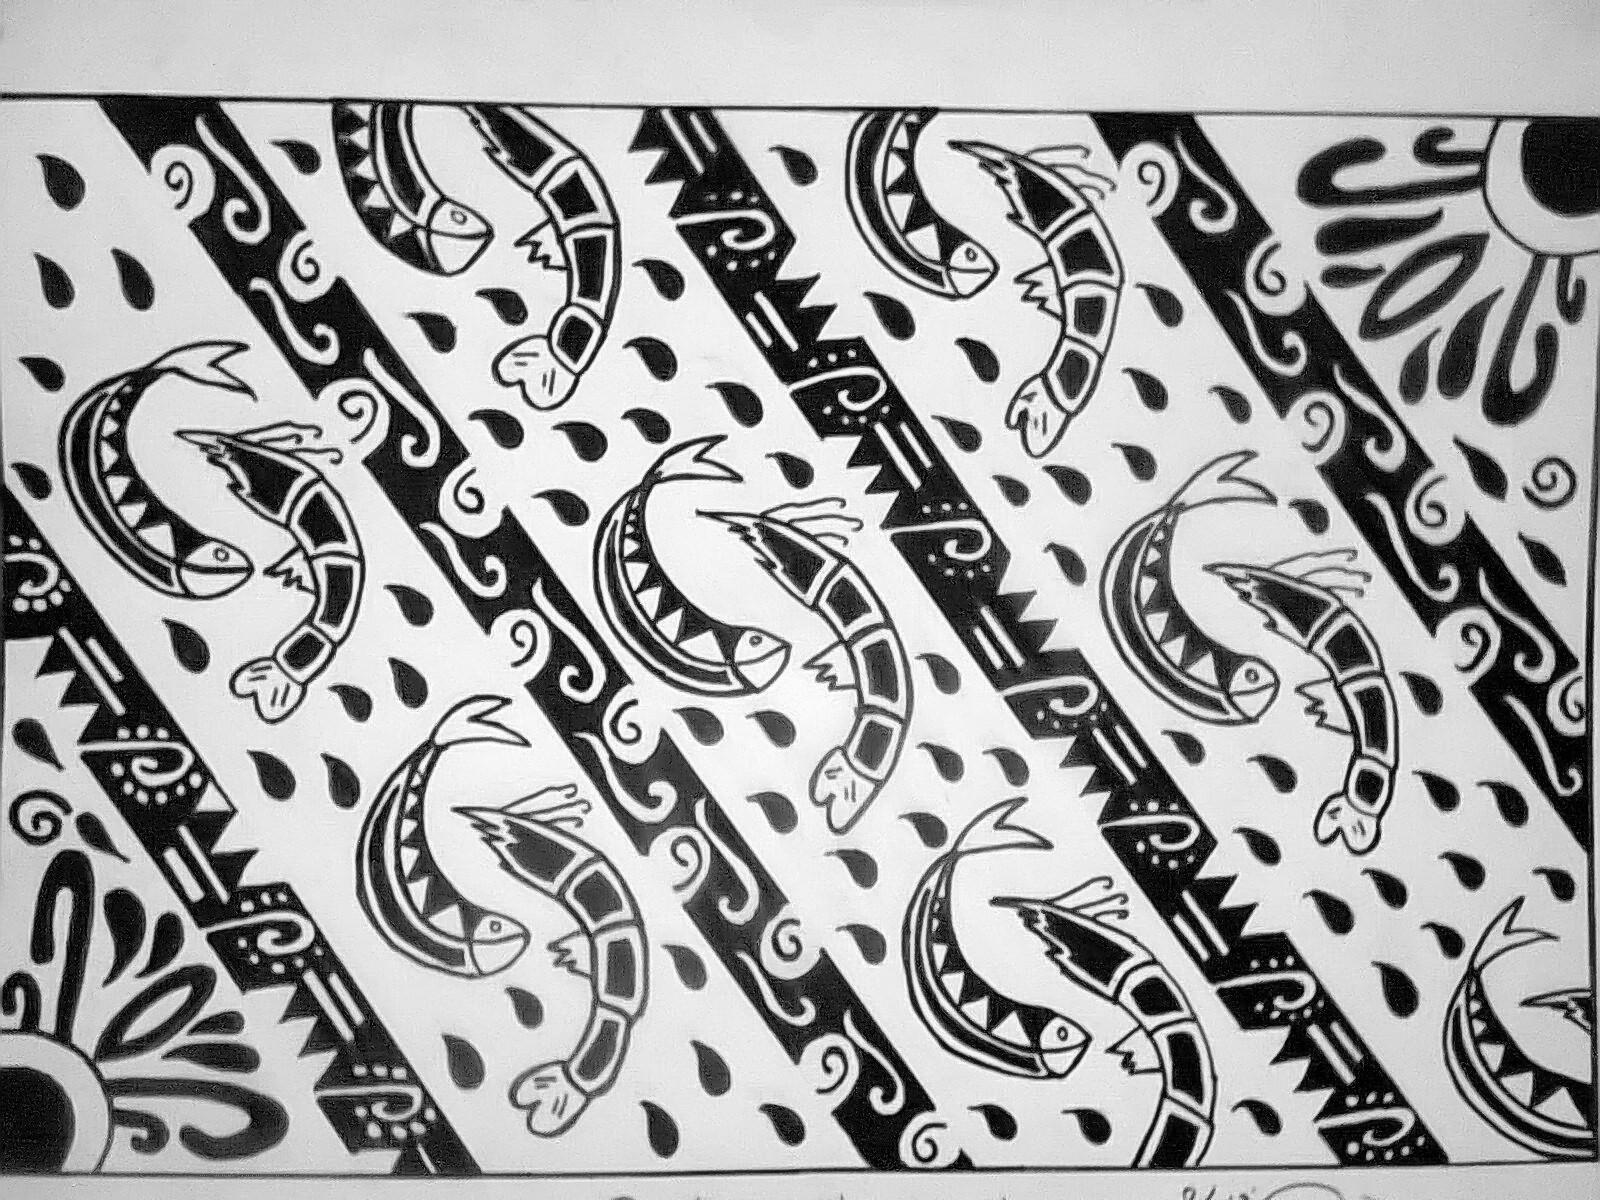 Gambar Lukisan Alam Tanpa Warna also Doraemon Para Colorear additionally Gambar Lukisan Pemandangan Sawah Padi also 3d Graffiti Creator in addition Creative Cool Simple Paintings Used Three Canvas Different Size Put On Plain Wall Paint Suitable For Living Room With Cozy Furniture And Artistic Item Decor. on lukisan abstrak hitam putih